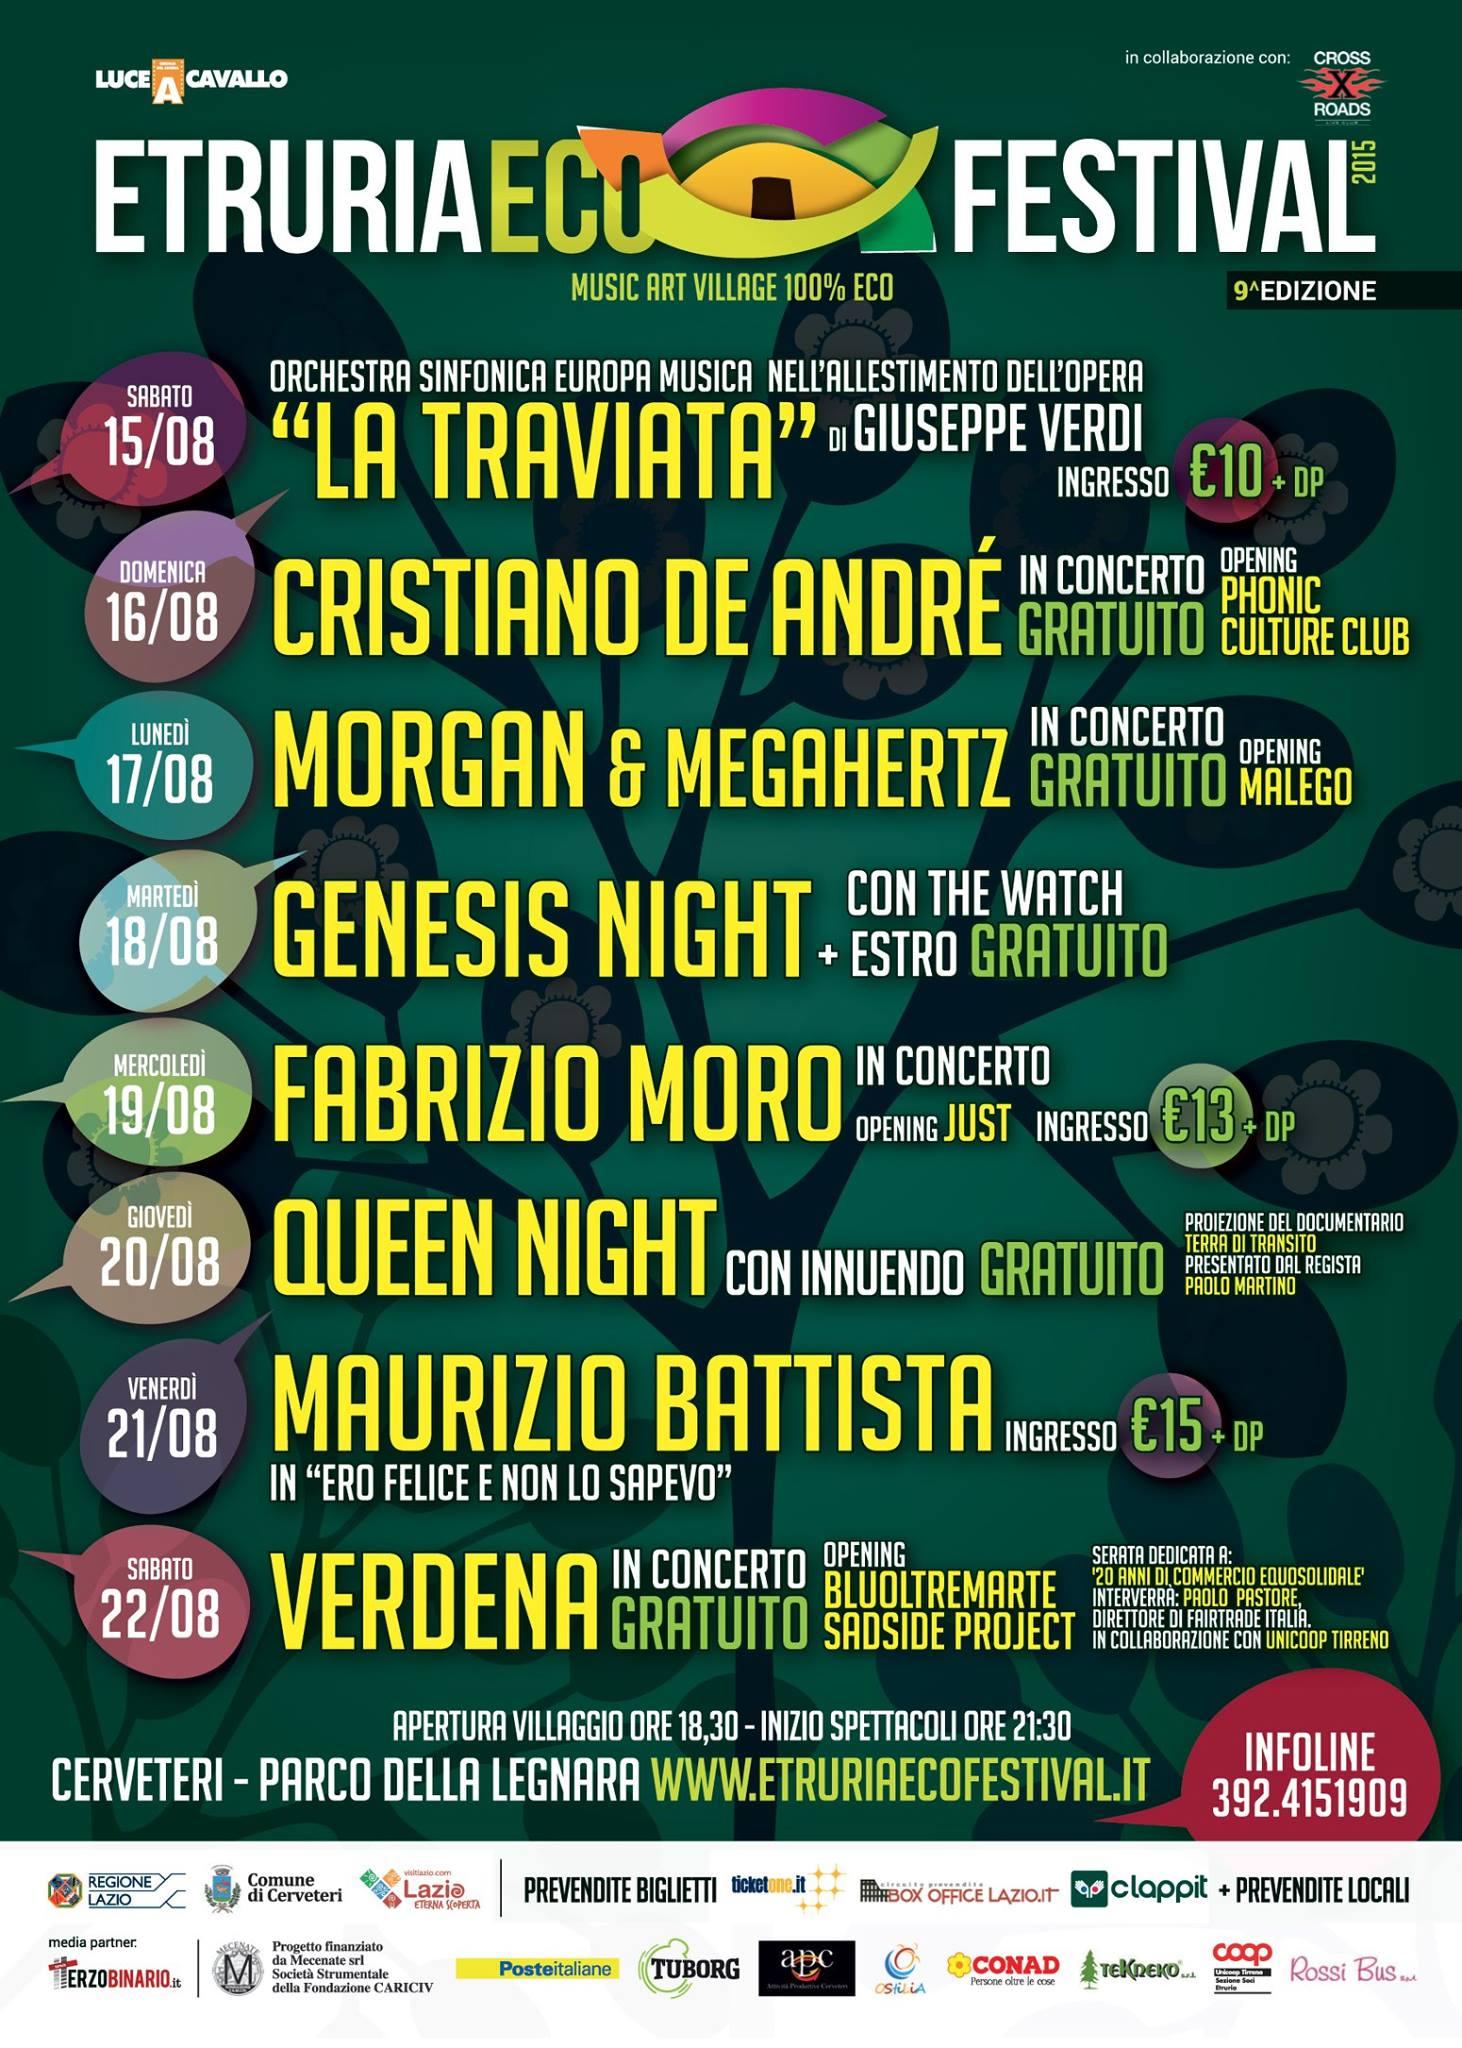 Etruria Eco Festival 2015 - Programma